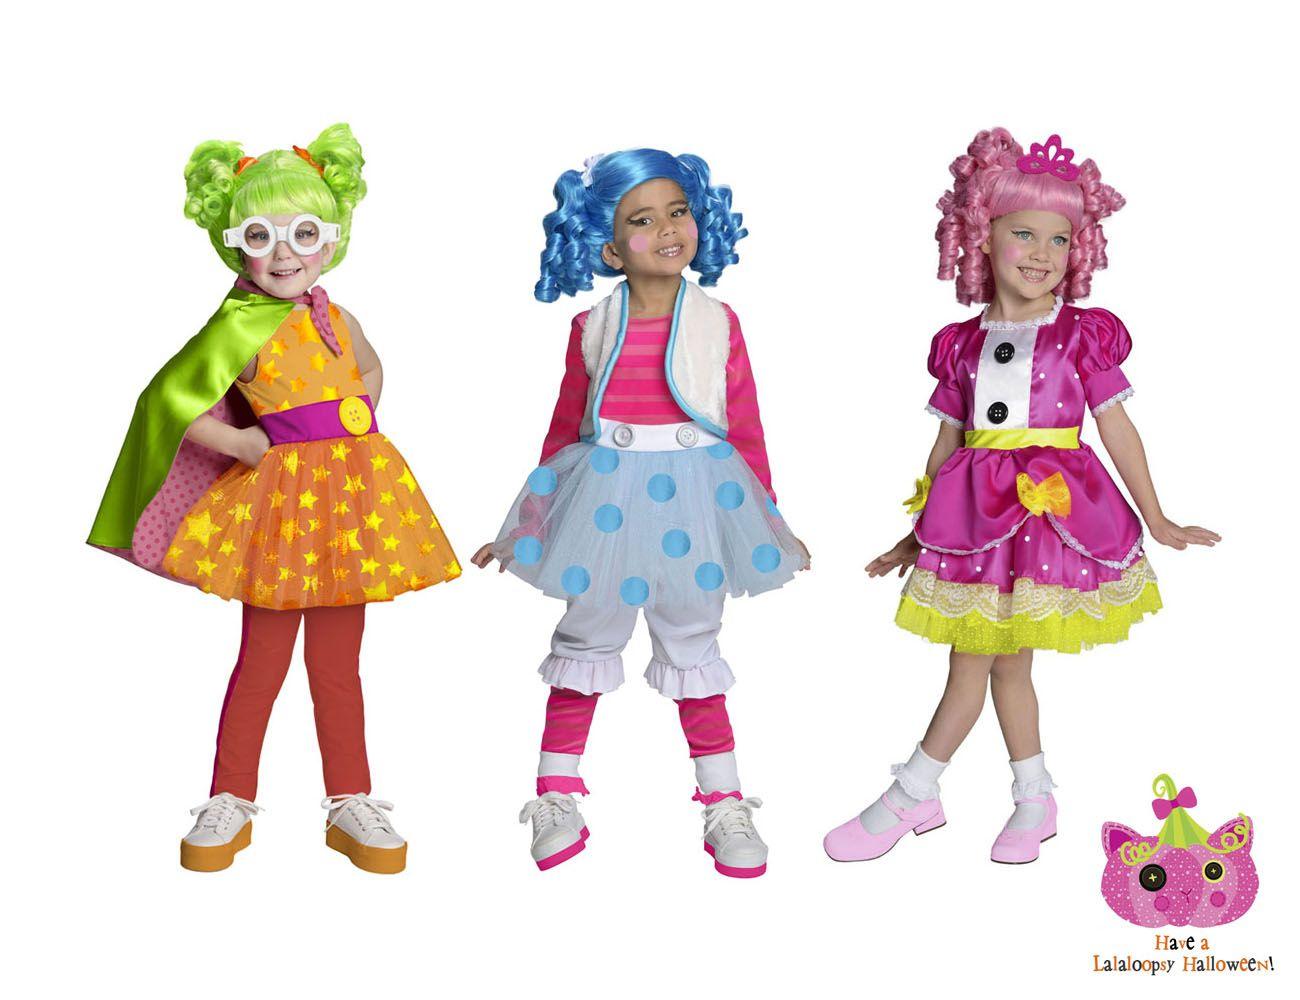 Sew cute Lalaloopsy Costumes from Rubieu0027s Costume Company!  sc 1 st  Pinterest & Sew cute Lalaloopsy Costumes from Rubieu0027s Costume Company ...